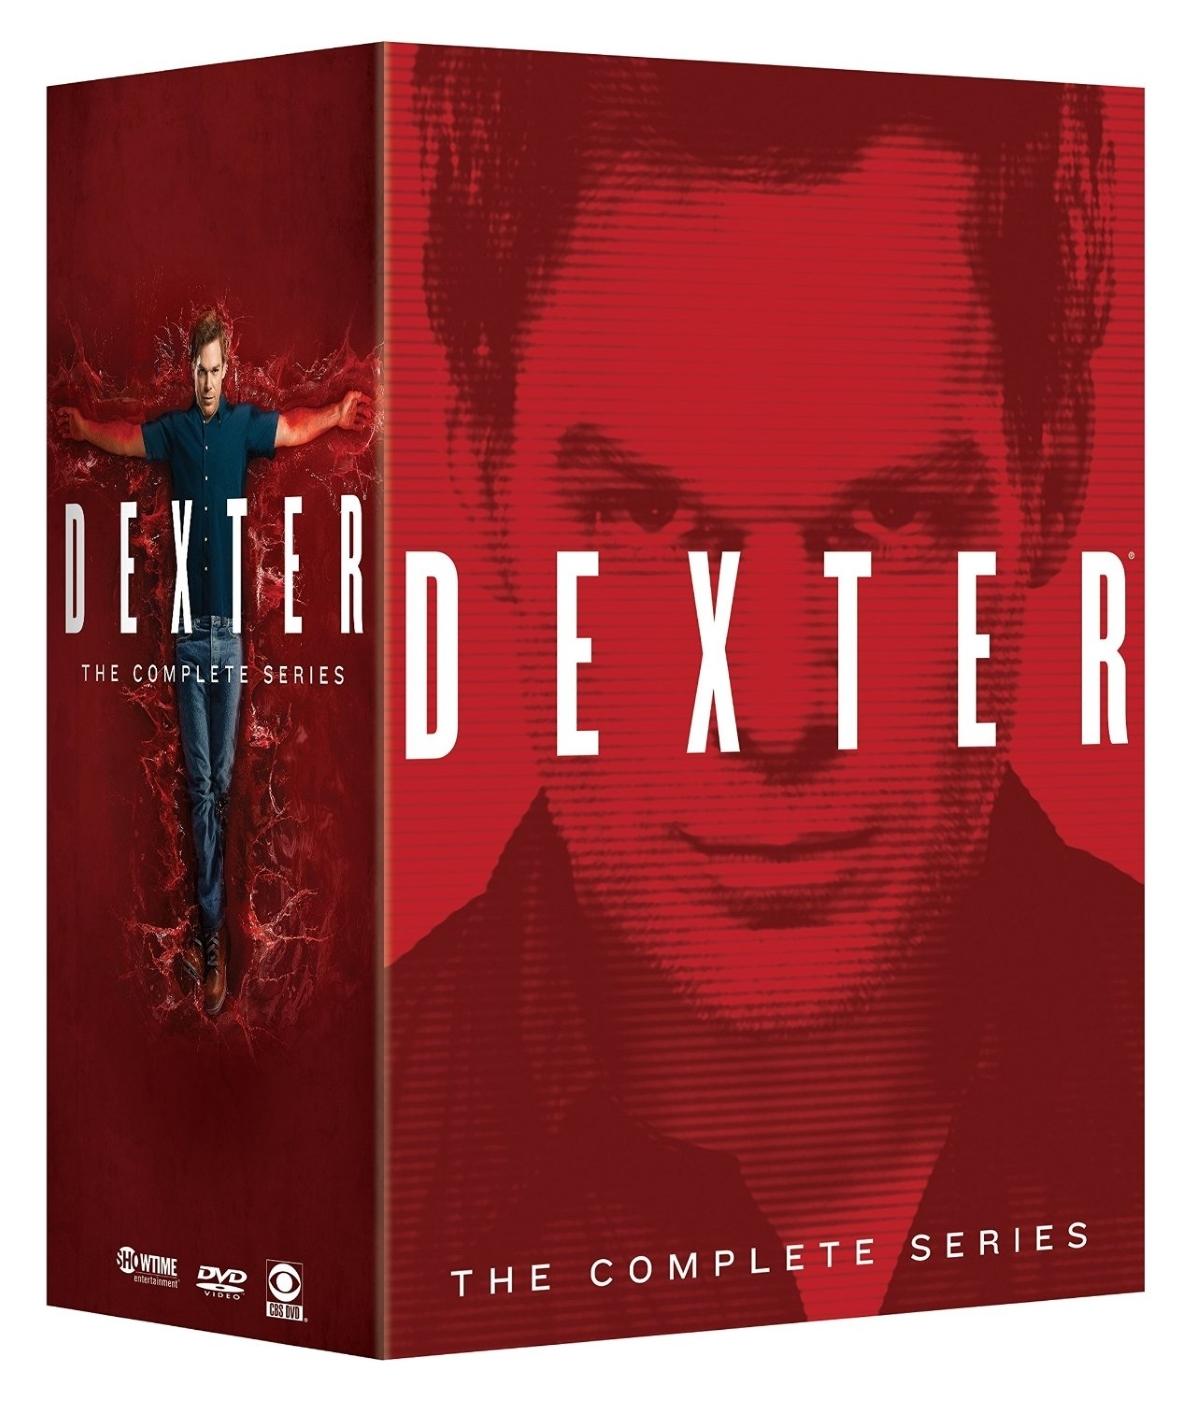 Dexter the complete series season 1 7  dvd 2015 32 disc  1 2 3 4 5 6 7 m.c.hall